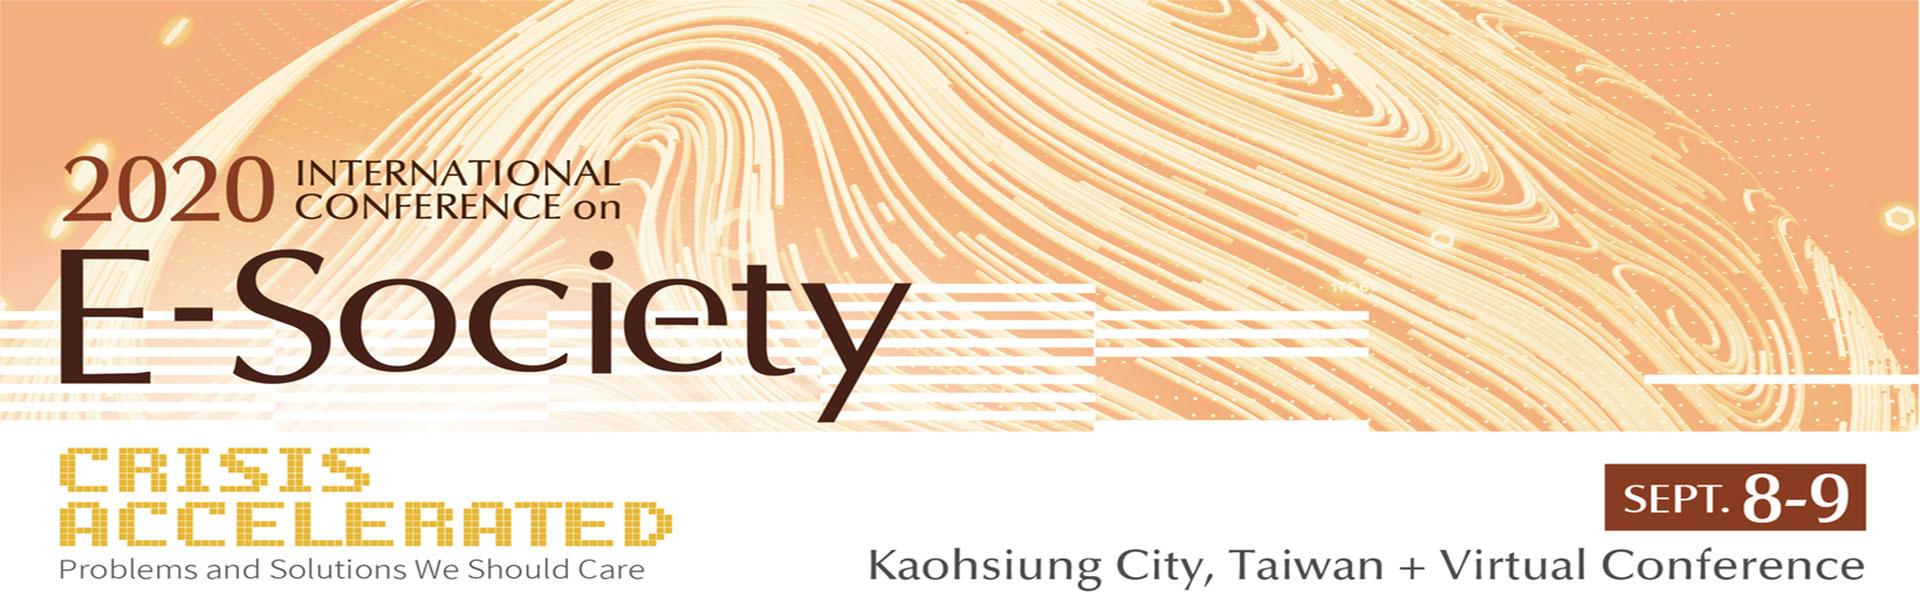 2020「E-Society網路社會國際研討會」徵稿啟事